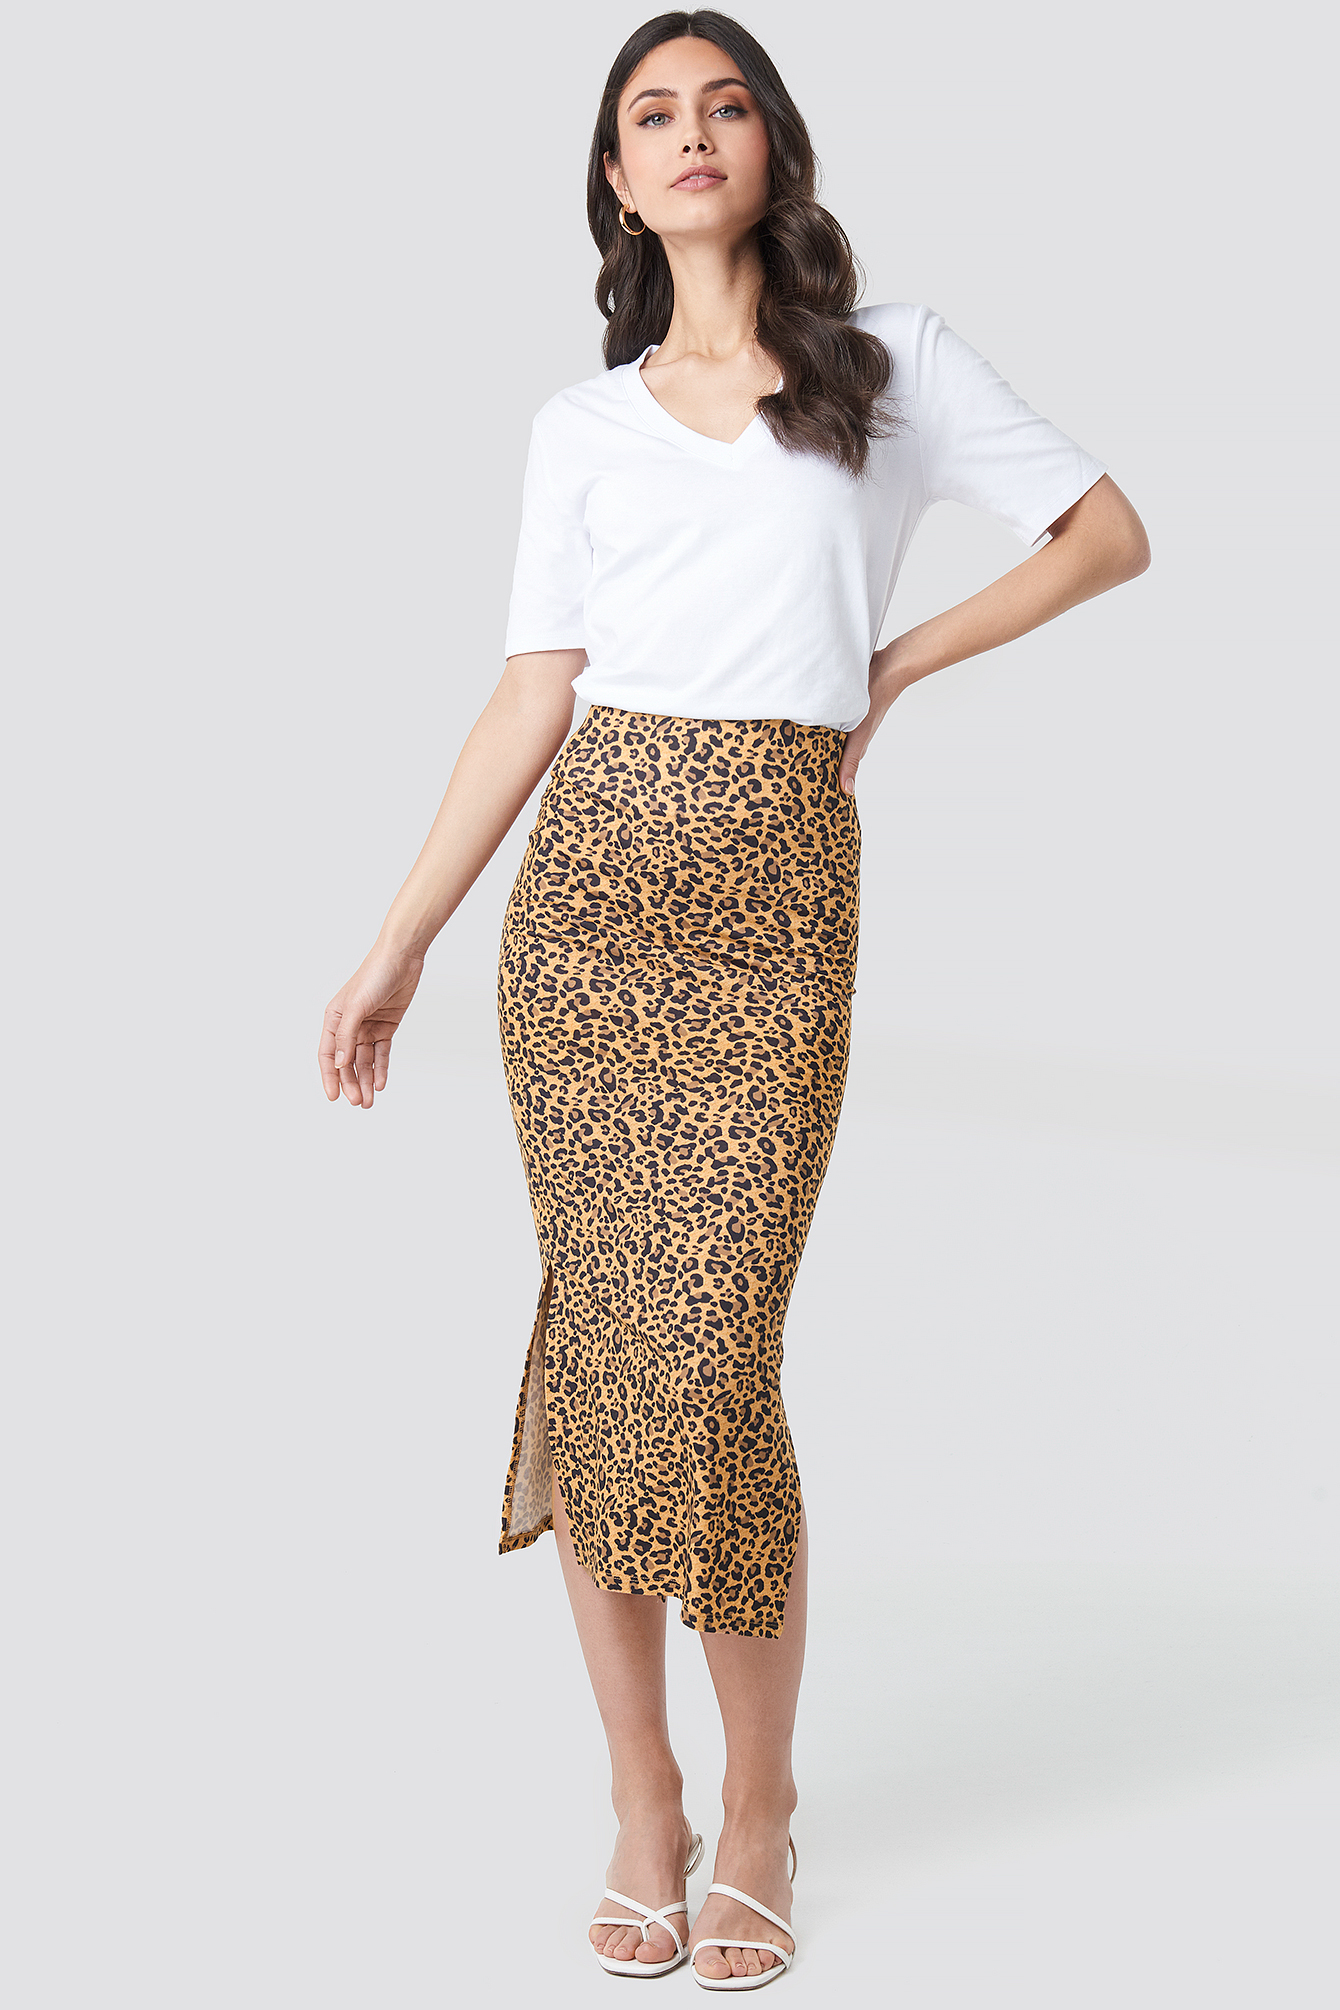 Jesey Side Slit Leo Printed Skirt NA-KD.COM